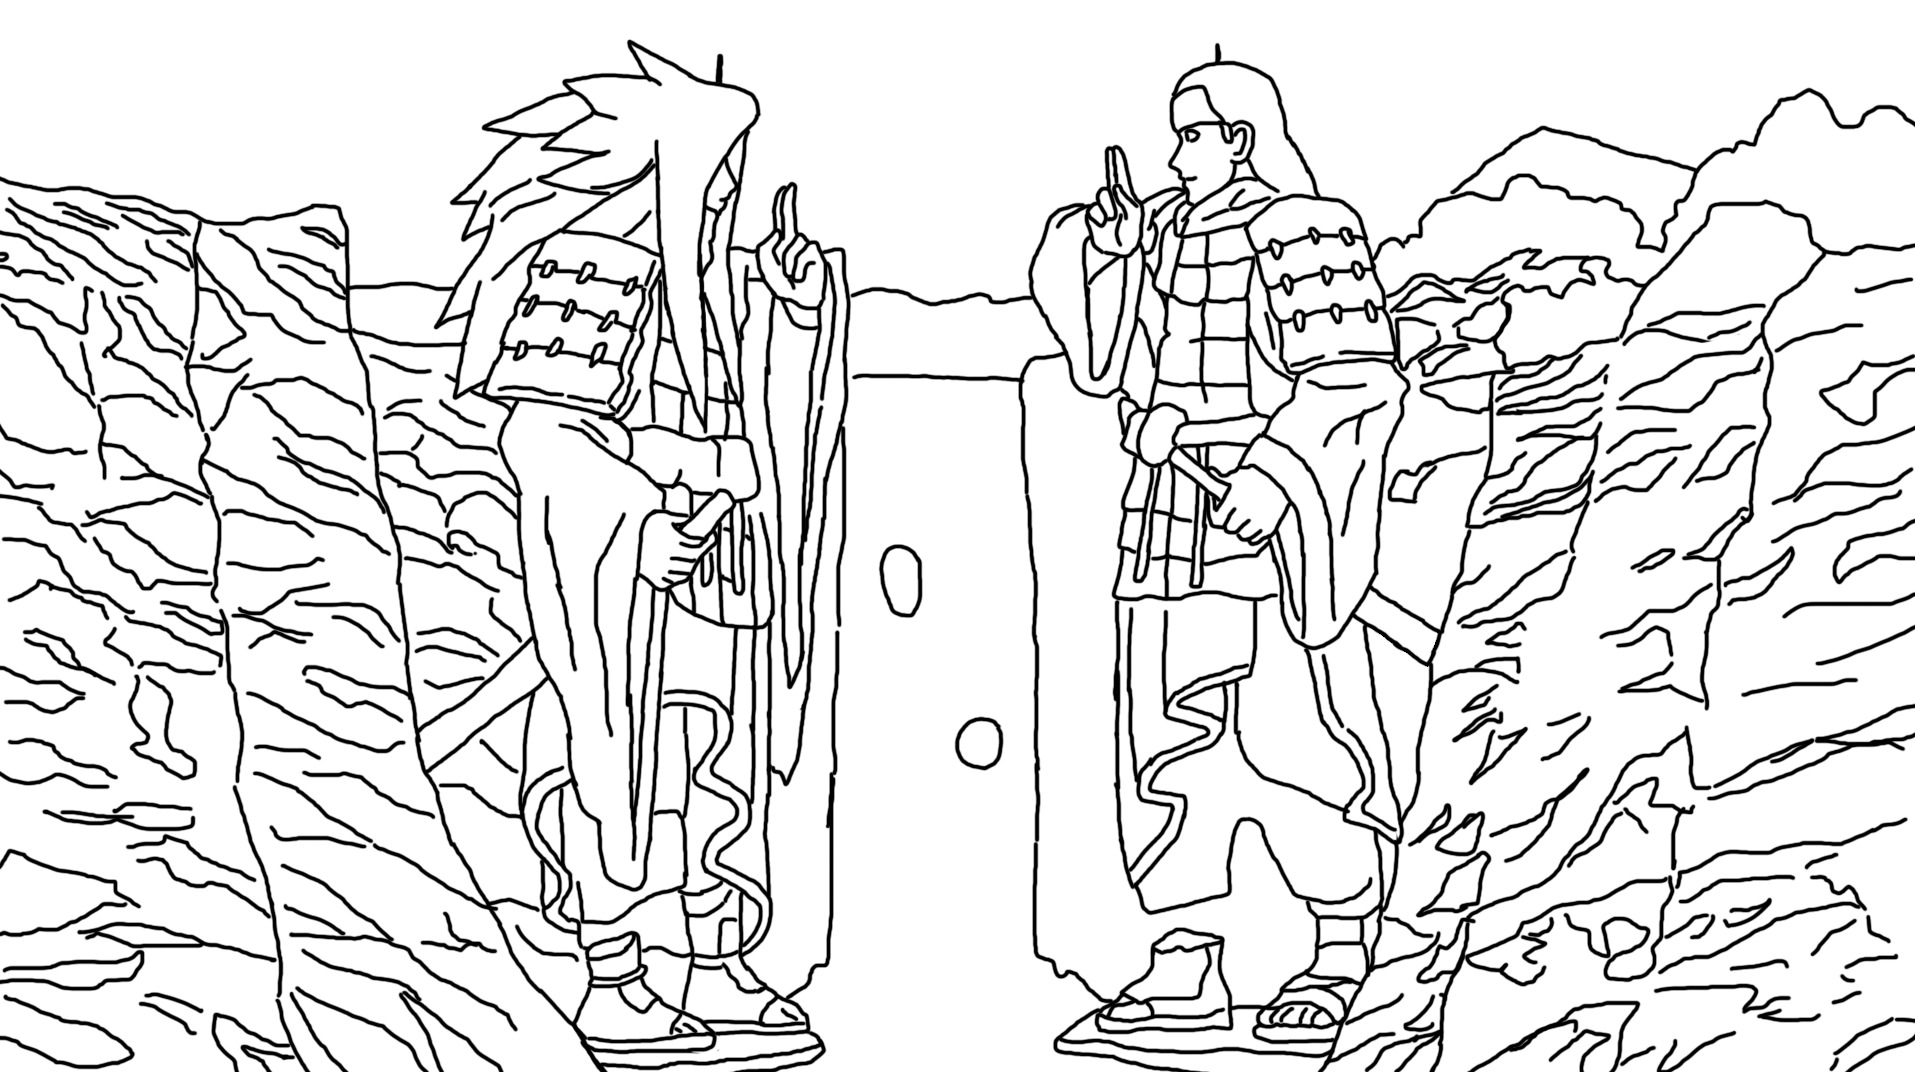 Hashirama Senju vs Madara Uchiha Coloring Page